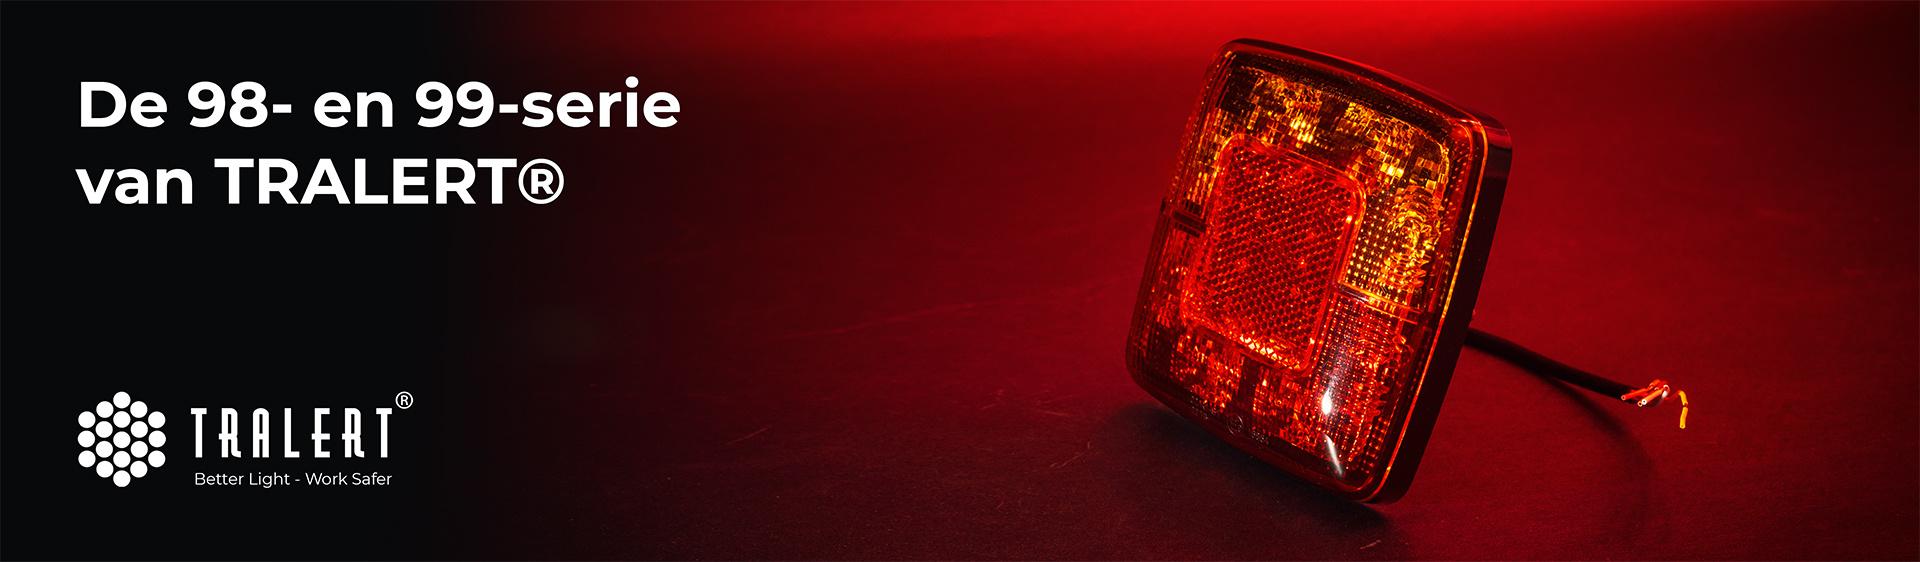 Tralert 98- en 99-serie LED achterlichten